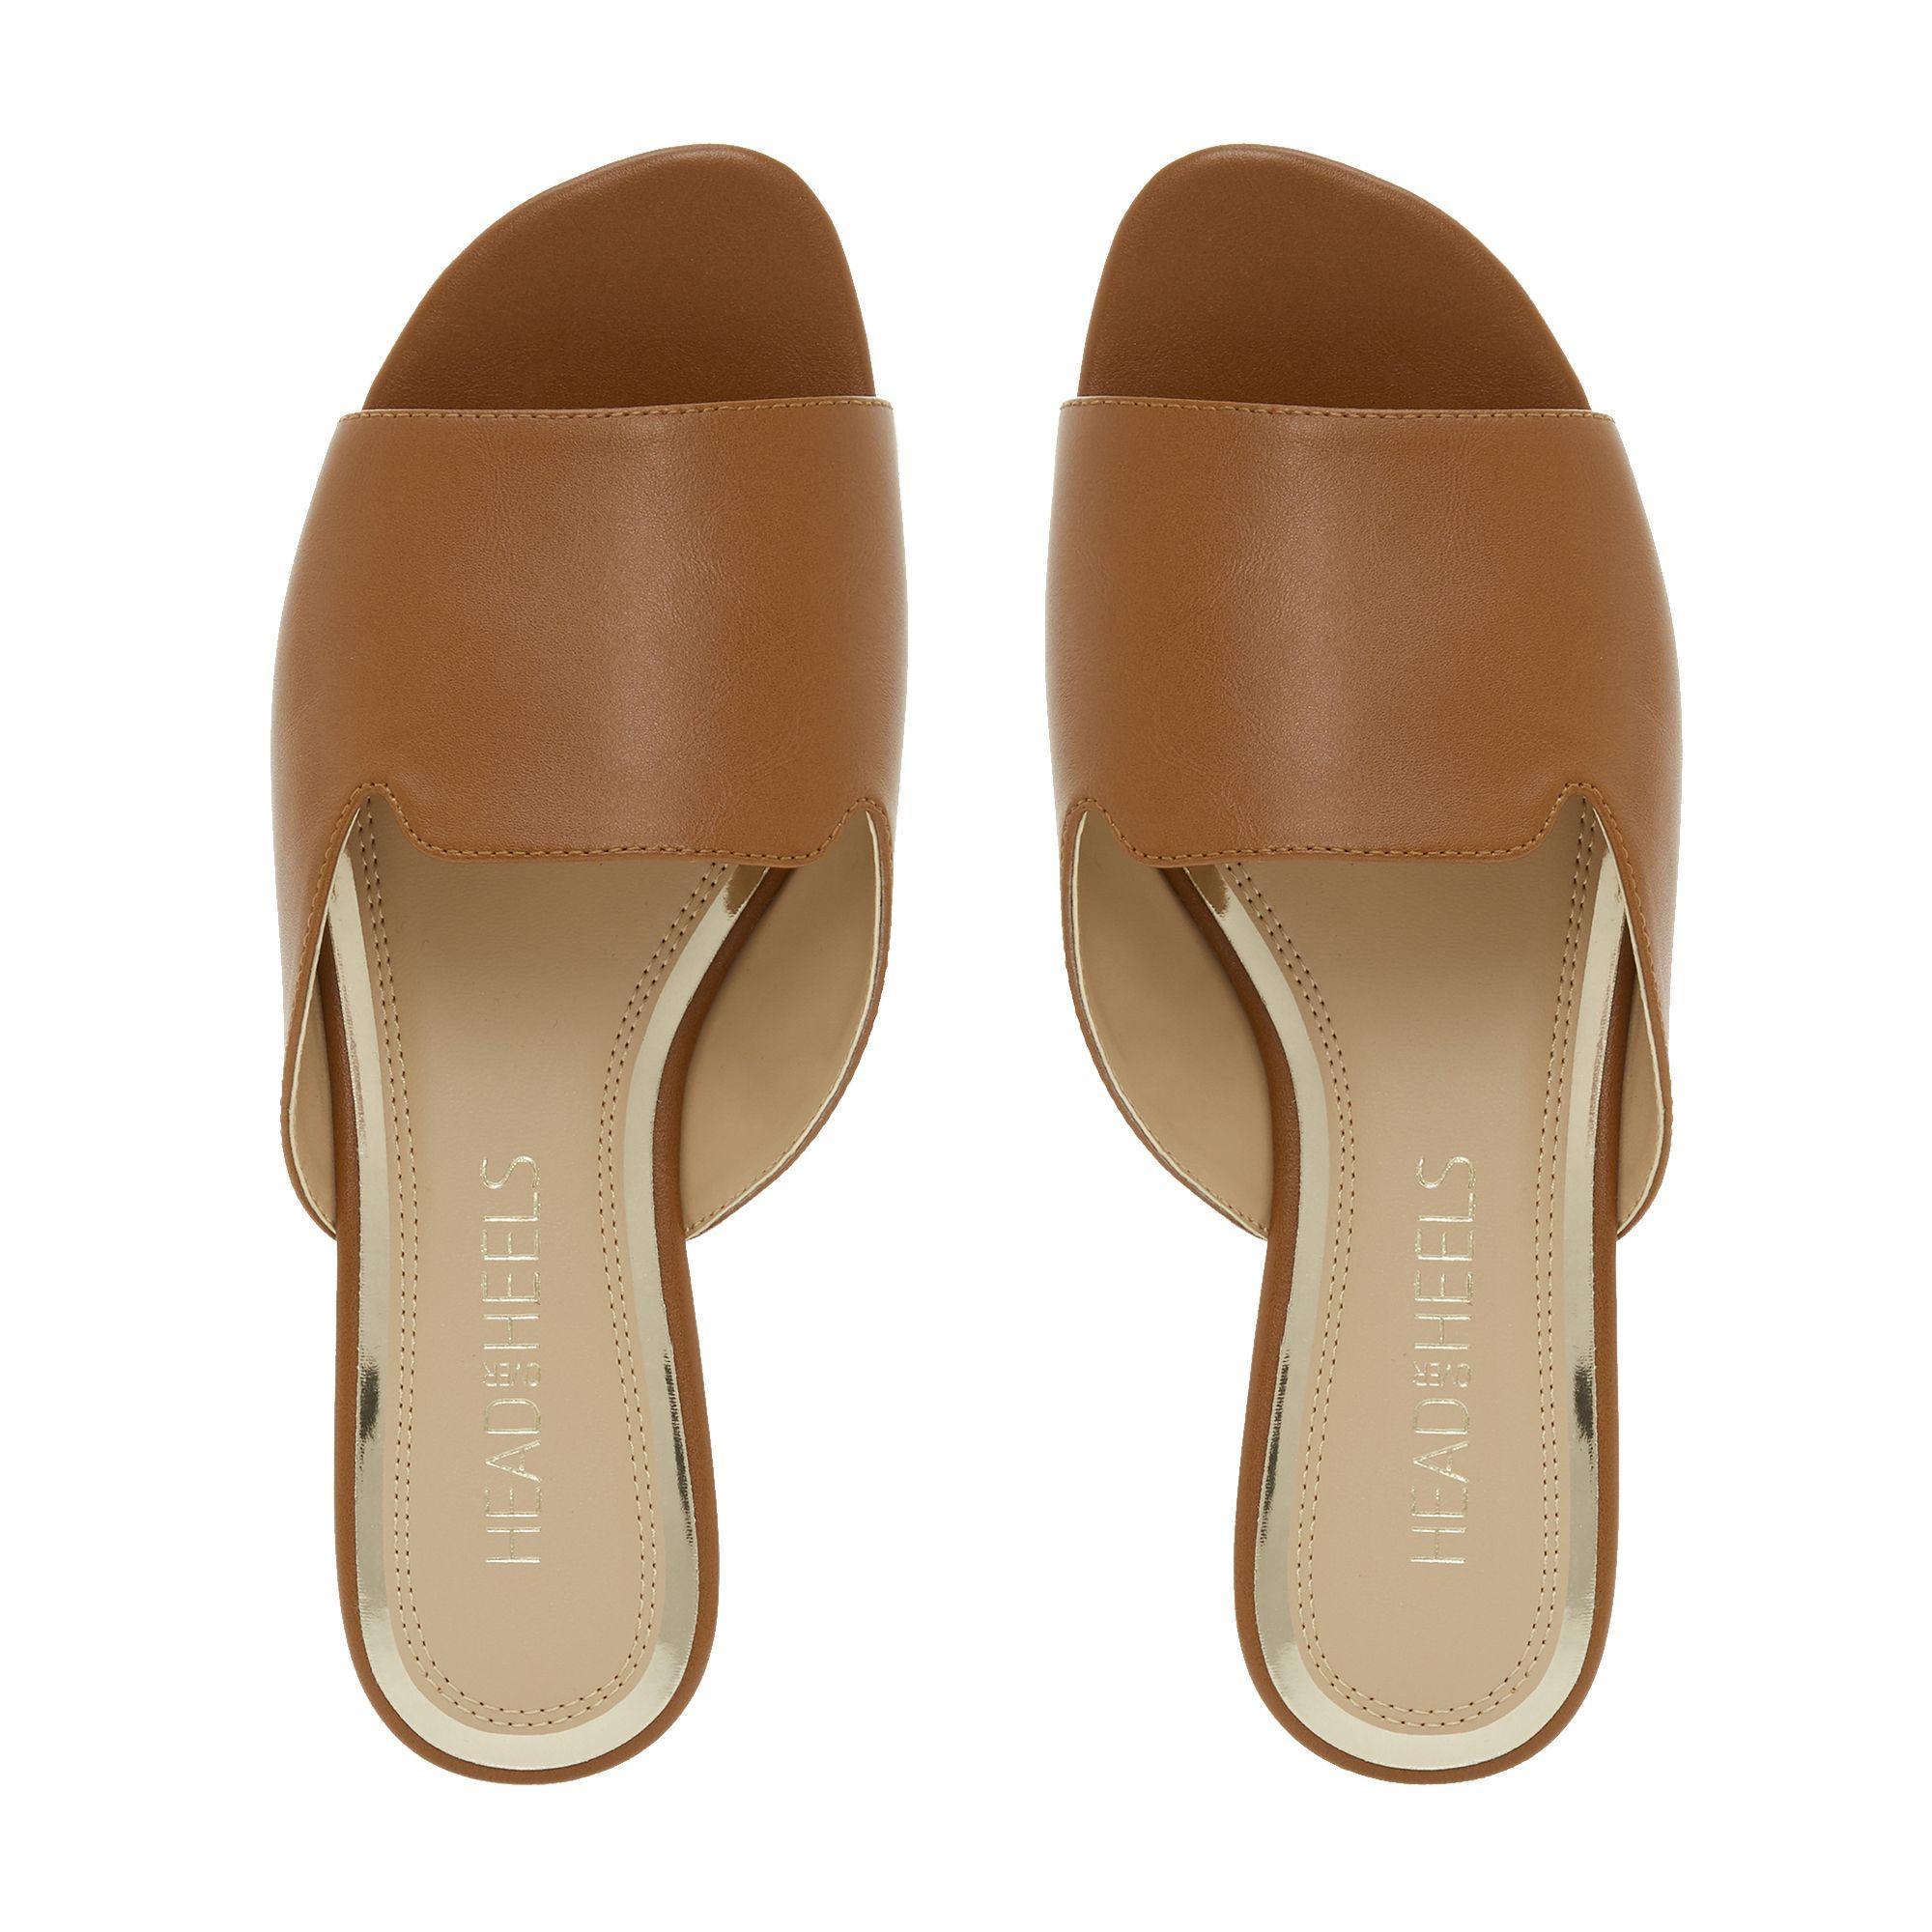 18f044e16 Dune - Brown Tan  lynn  Mule Sandals - Lyst. View fullscreen